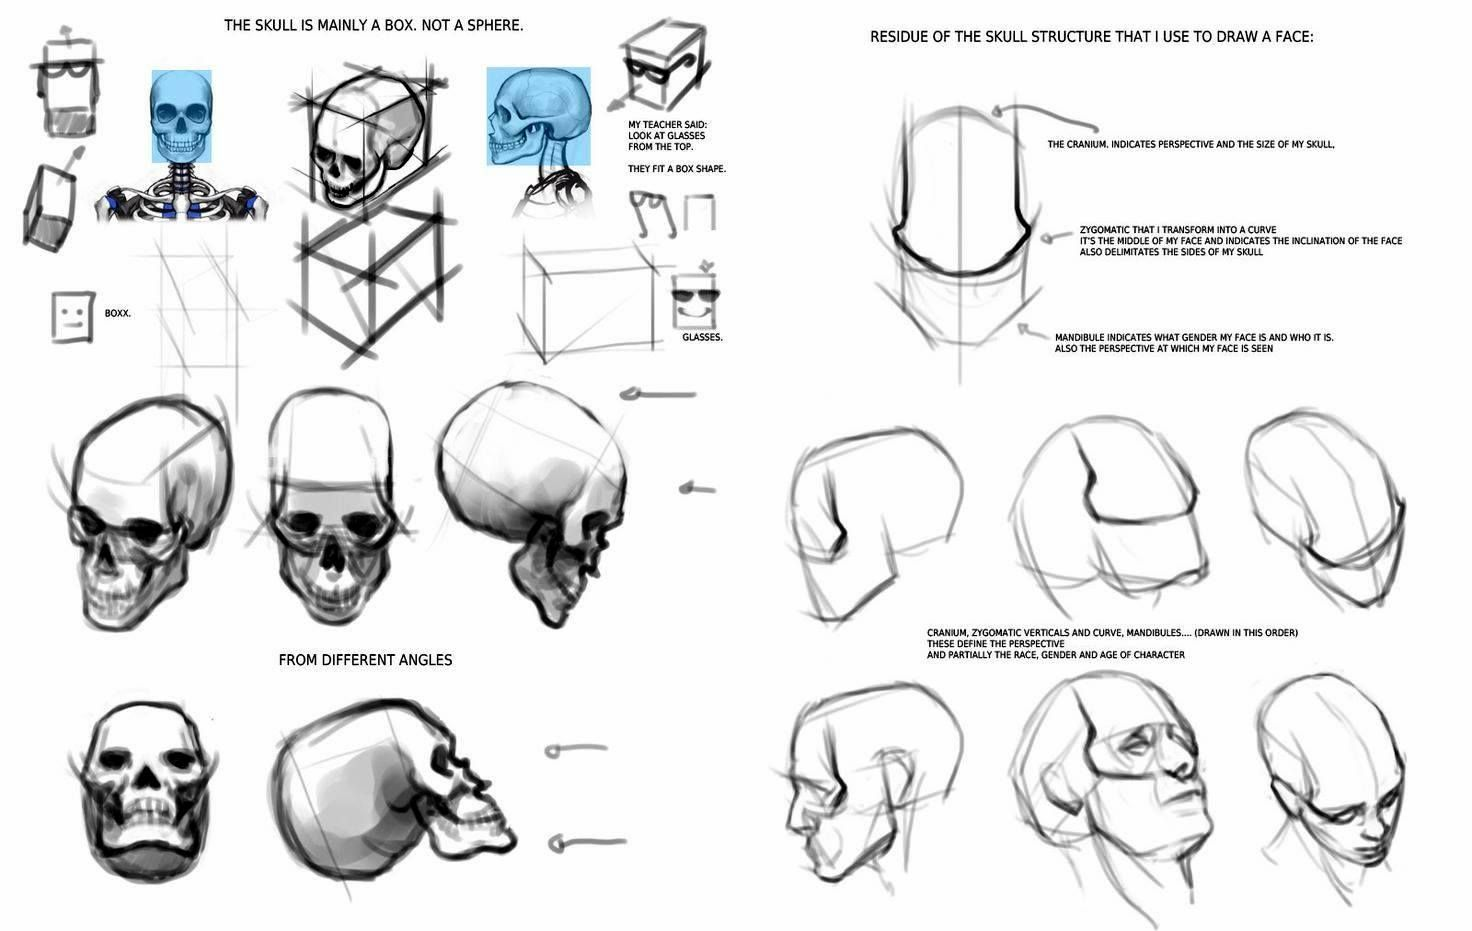 Pin de angels en Anatomia i Art 1 | Pinterest | Dibujar cabezas ...